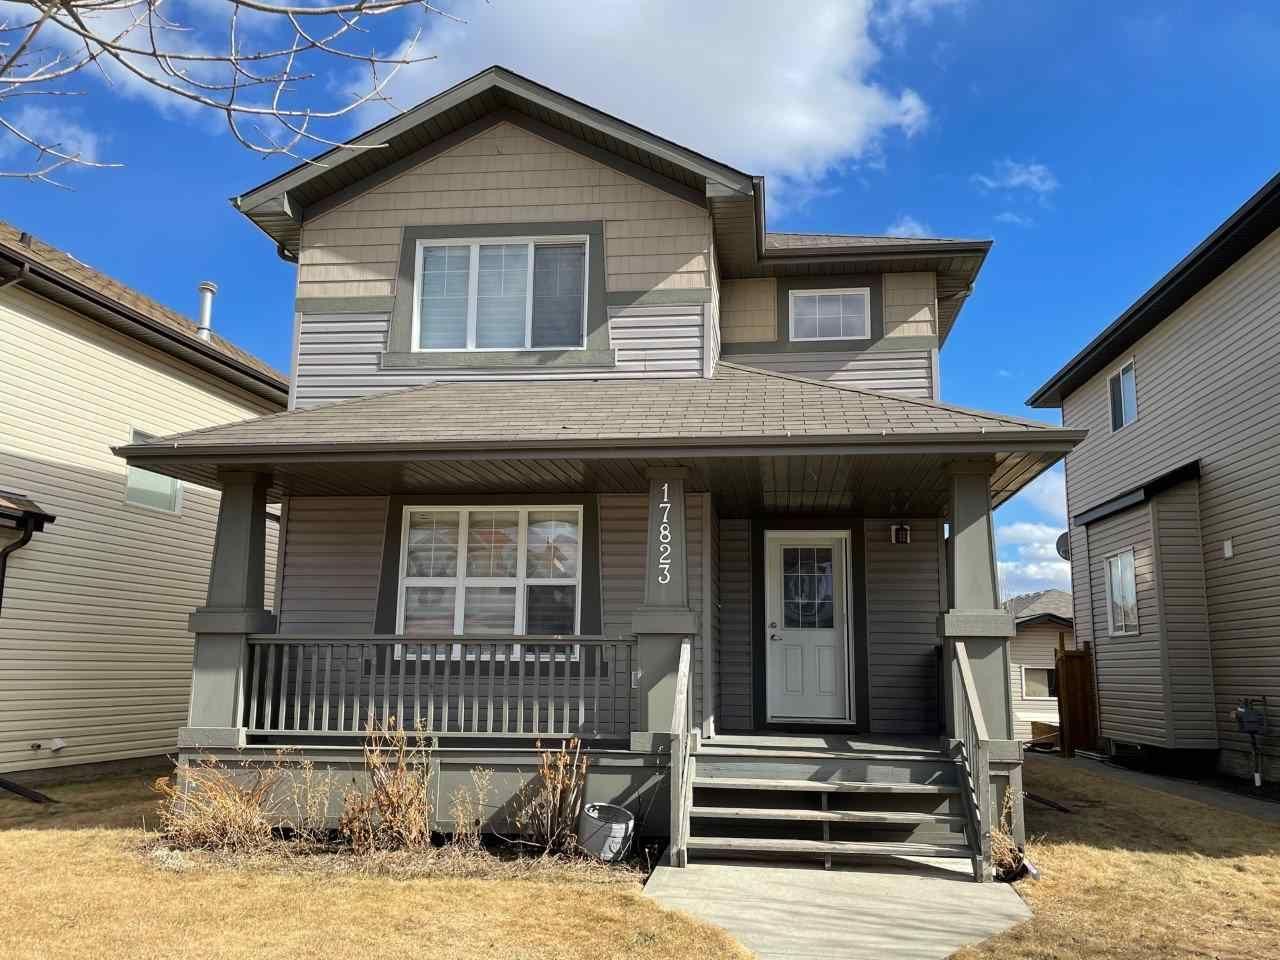 Main Photo: 17823 90 Street in Edmonton: Zone 28 House for sale : MLS®# E4237270